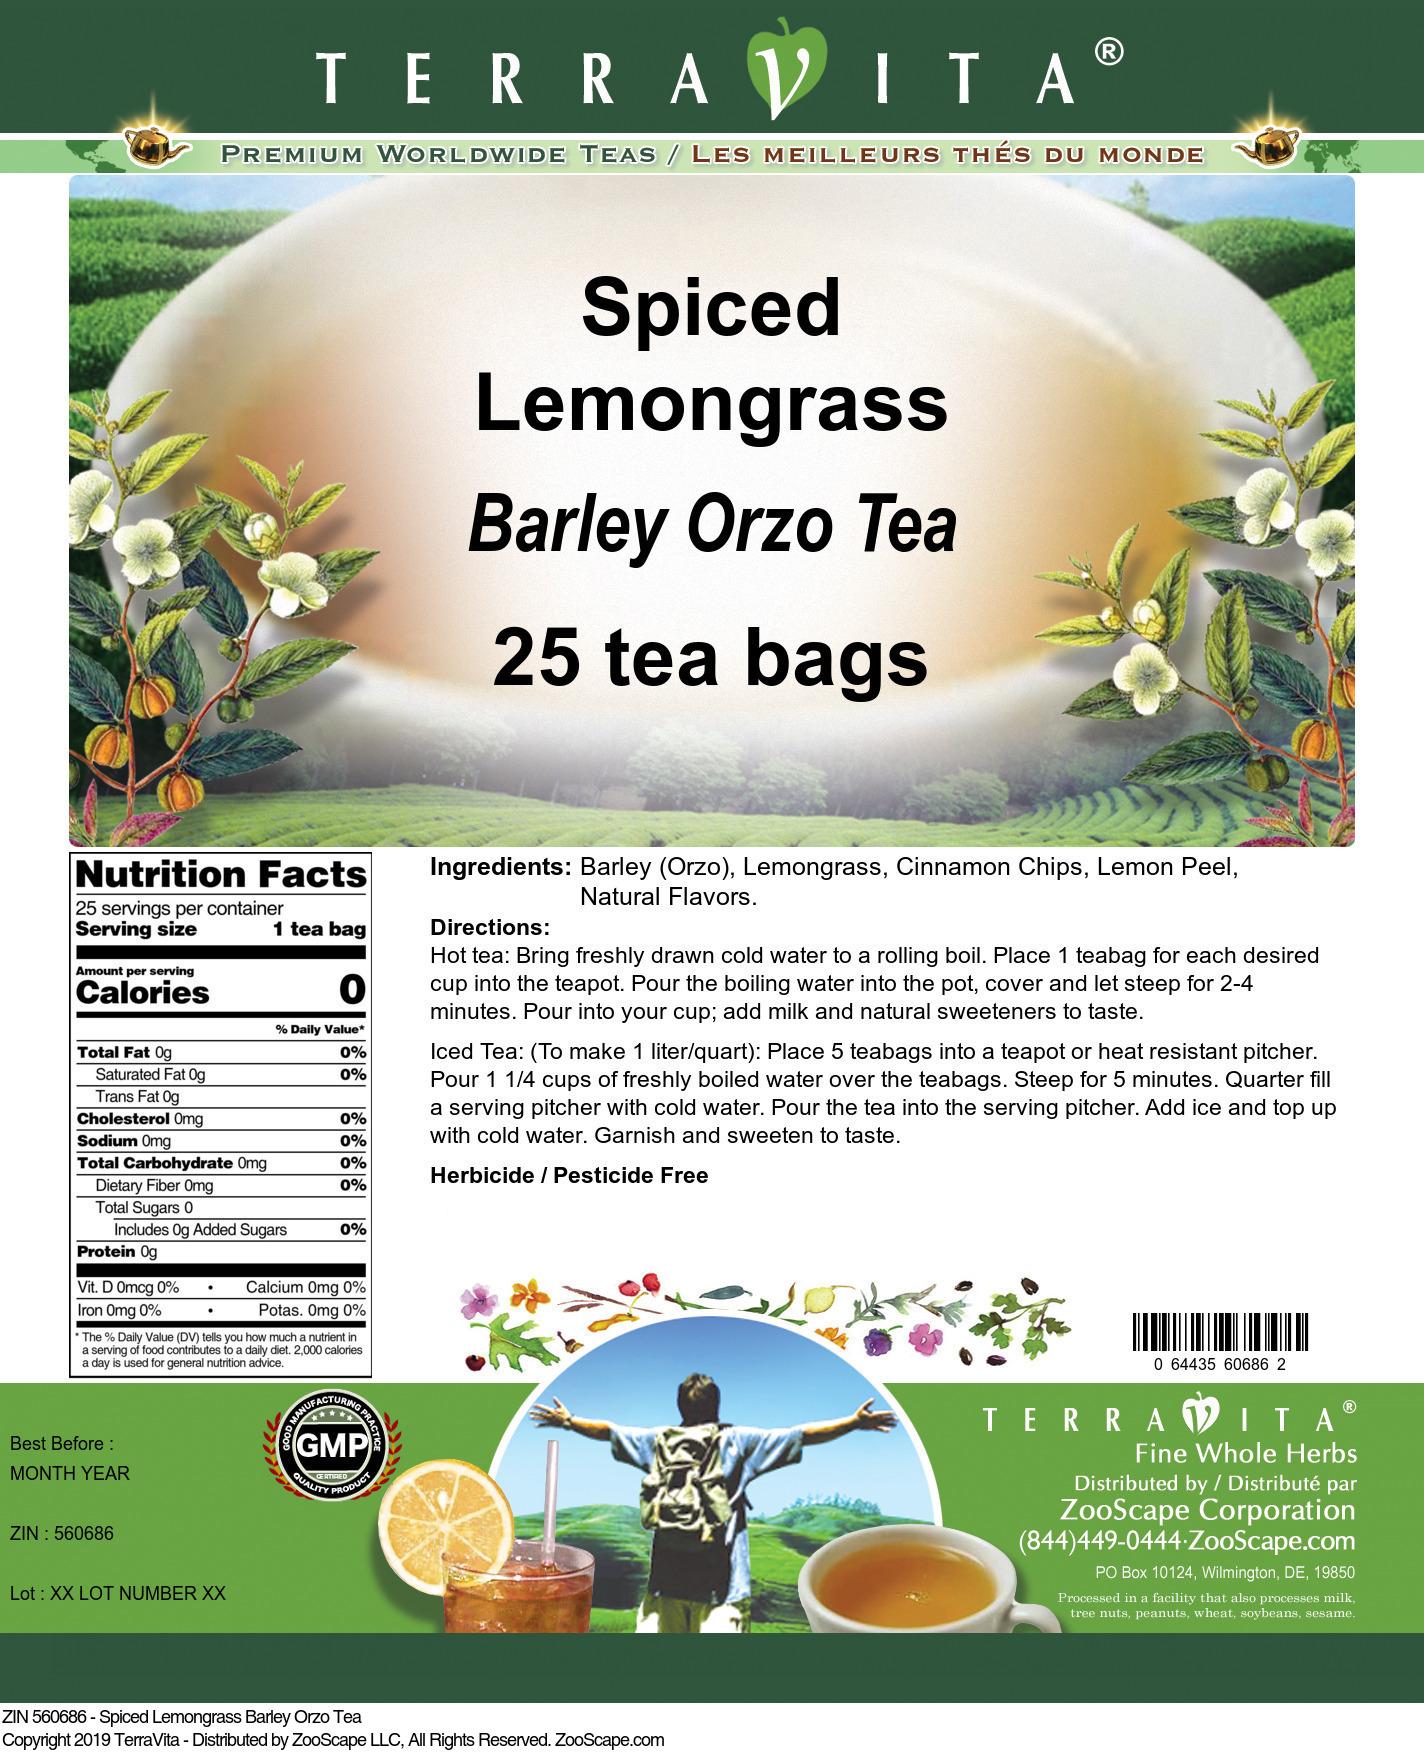 Spiced Lemongrass Barley Orzo